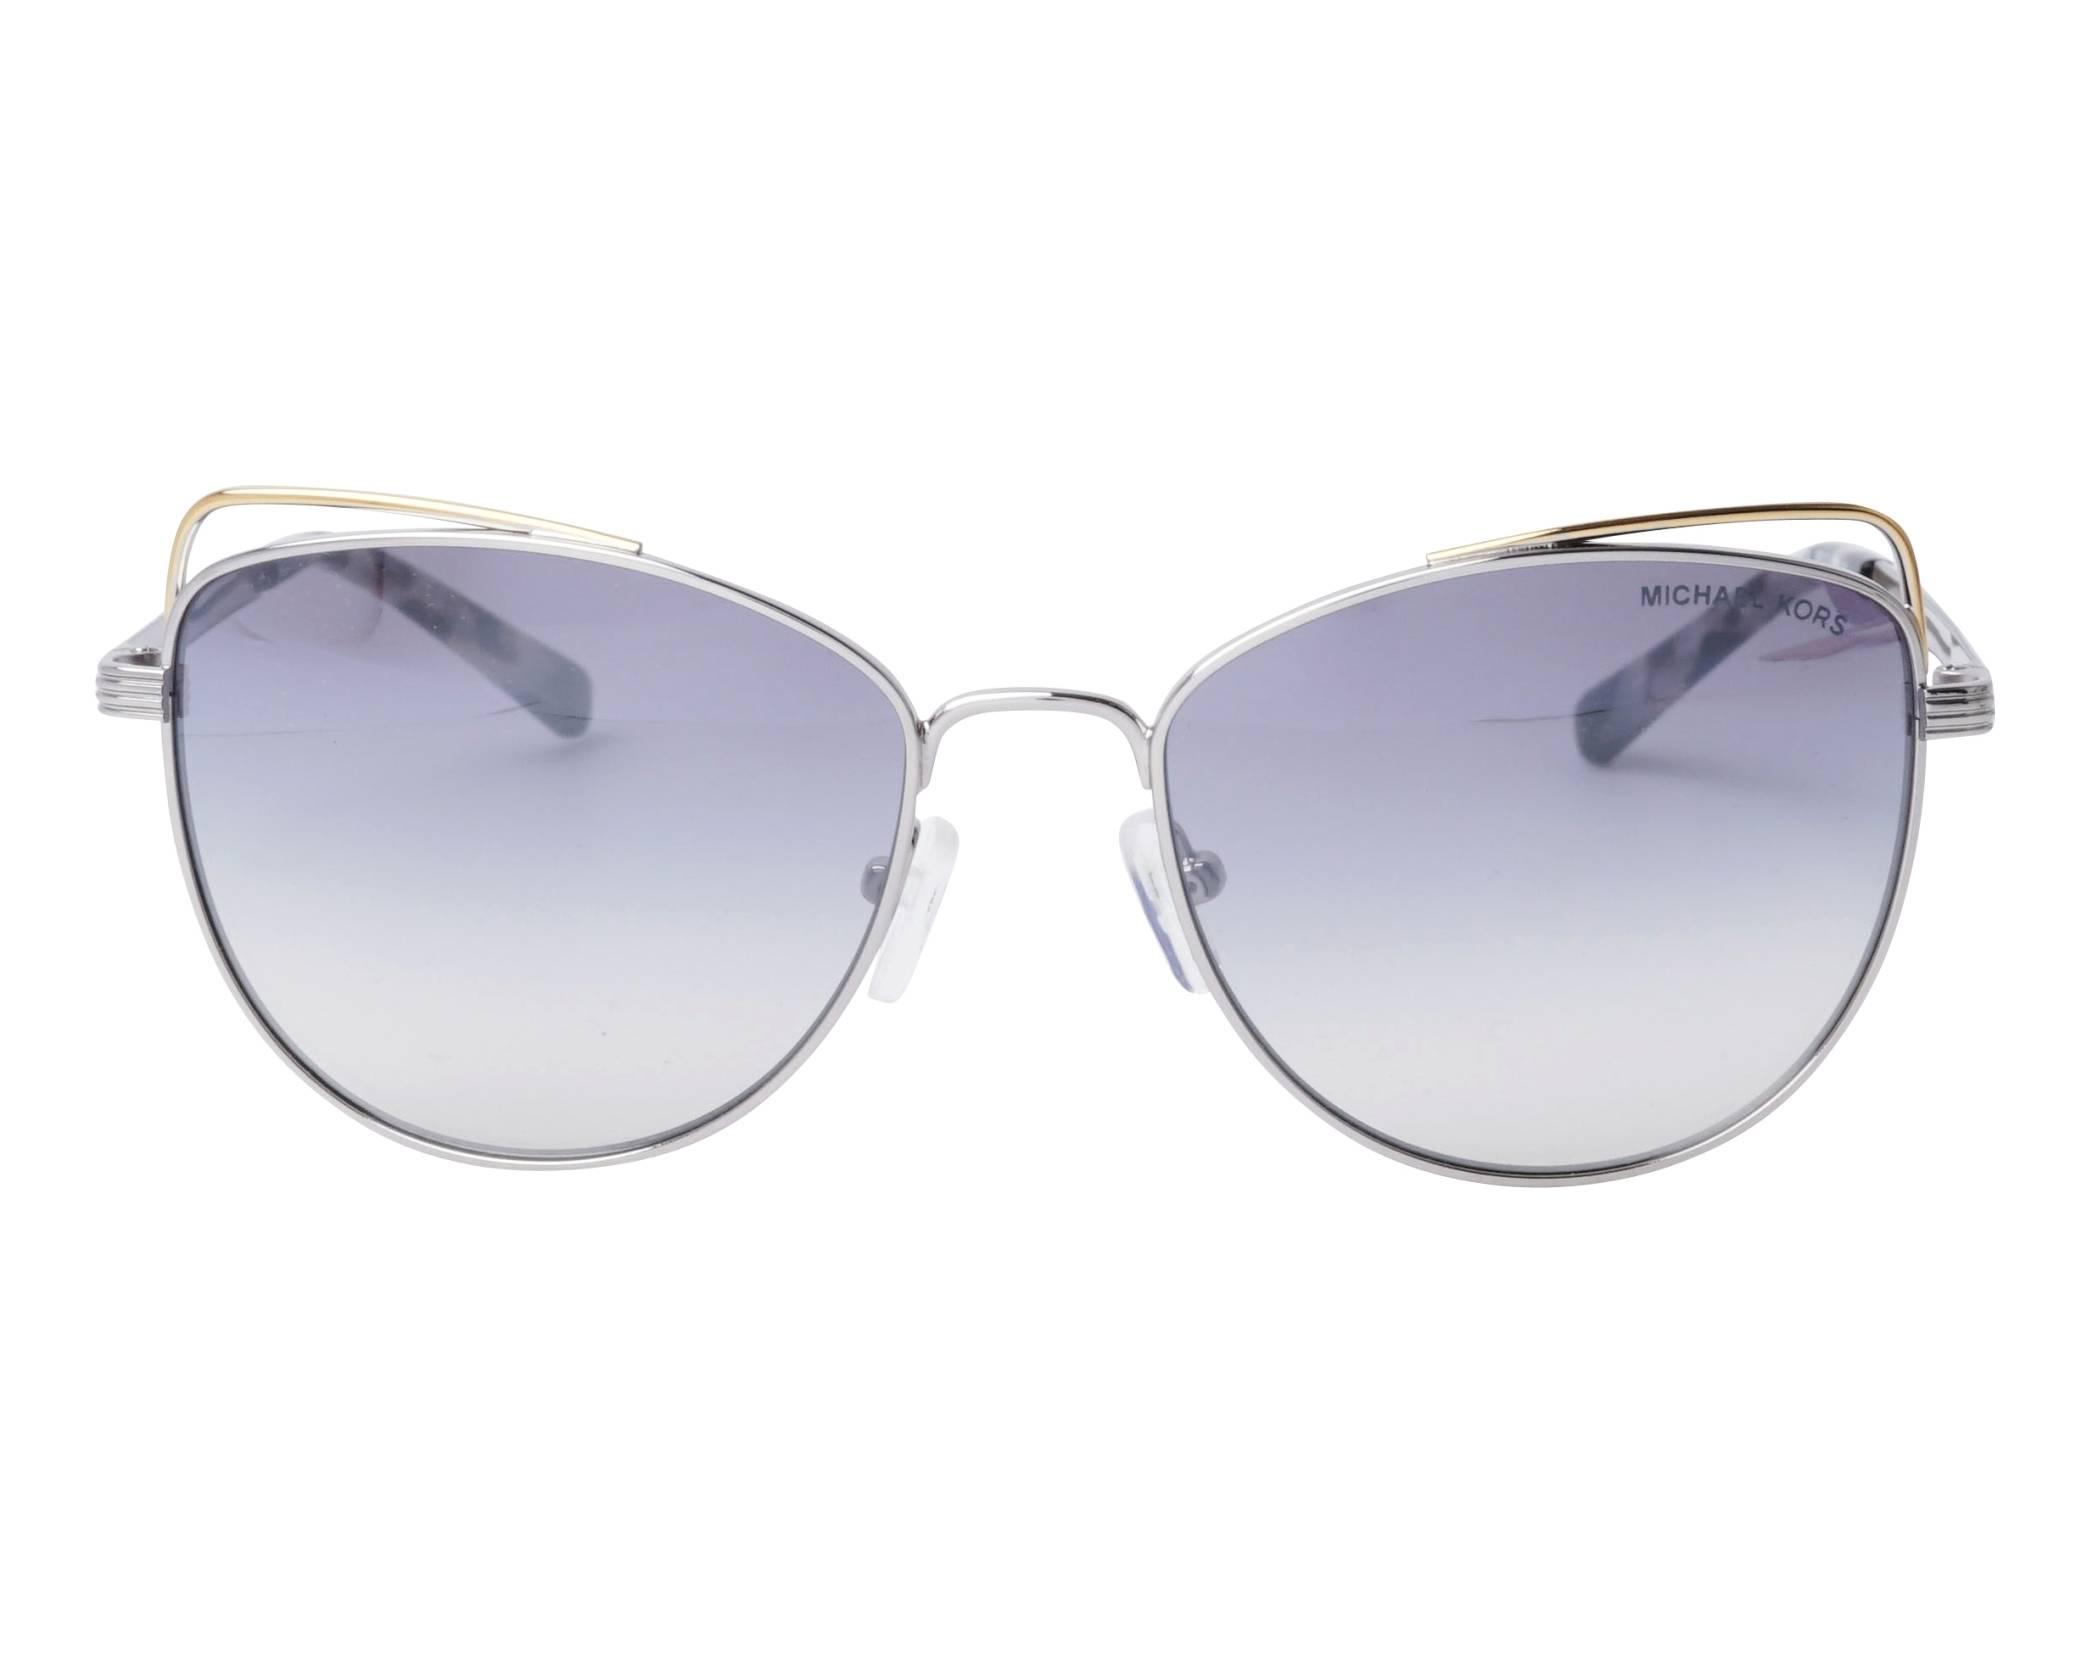 b3c07ec5c1 Sunglasses Michael Kors MK-1035 11537B 55-17 Silver Gold front view